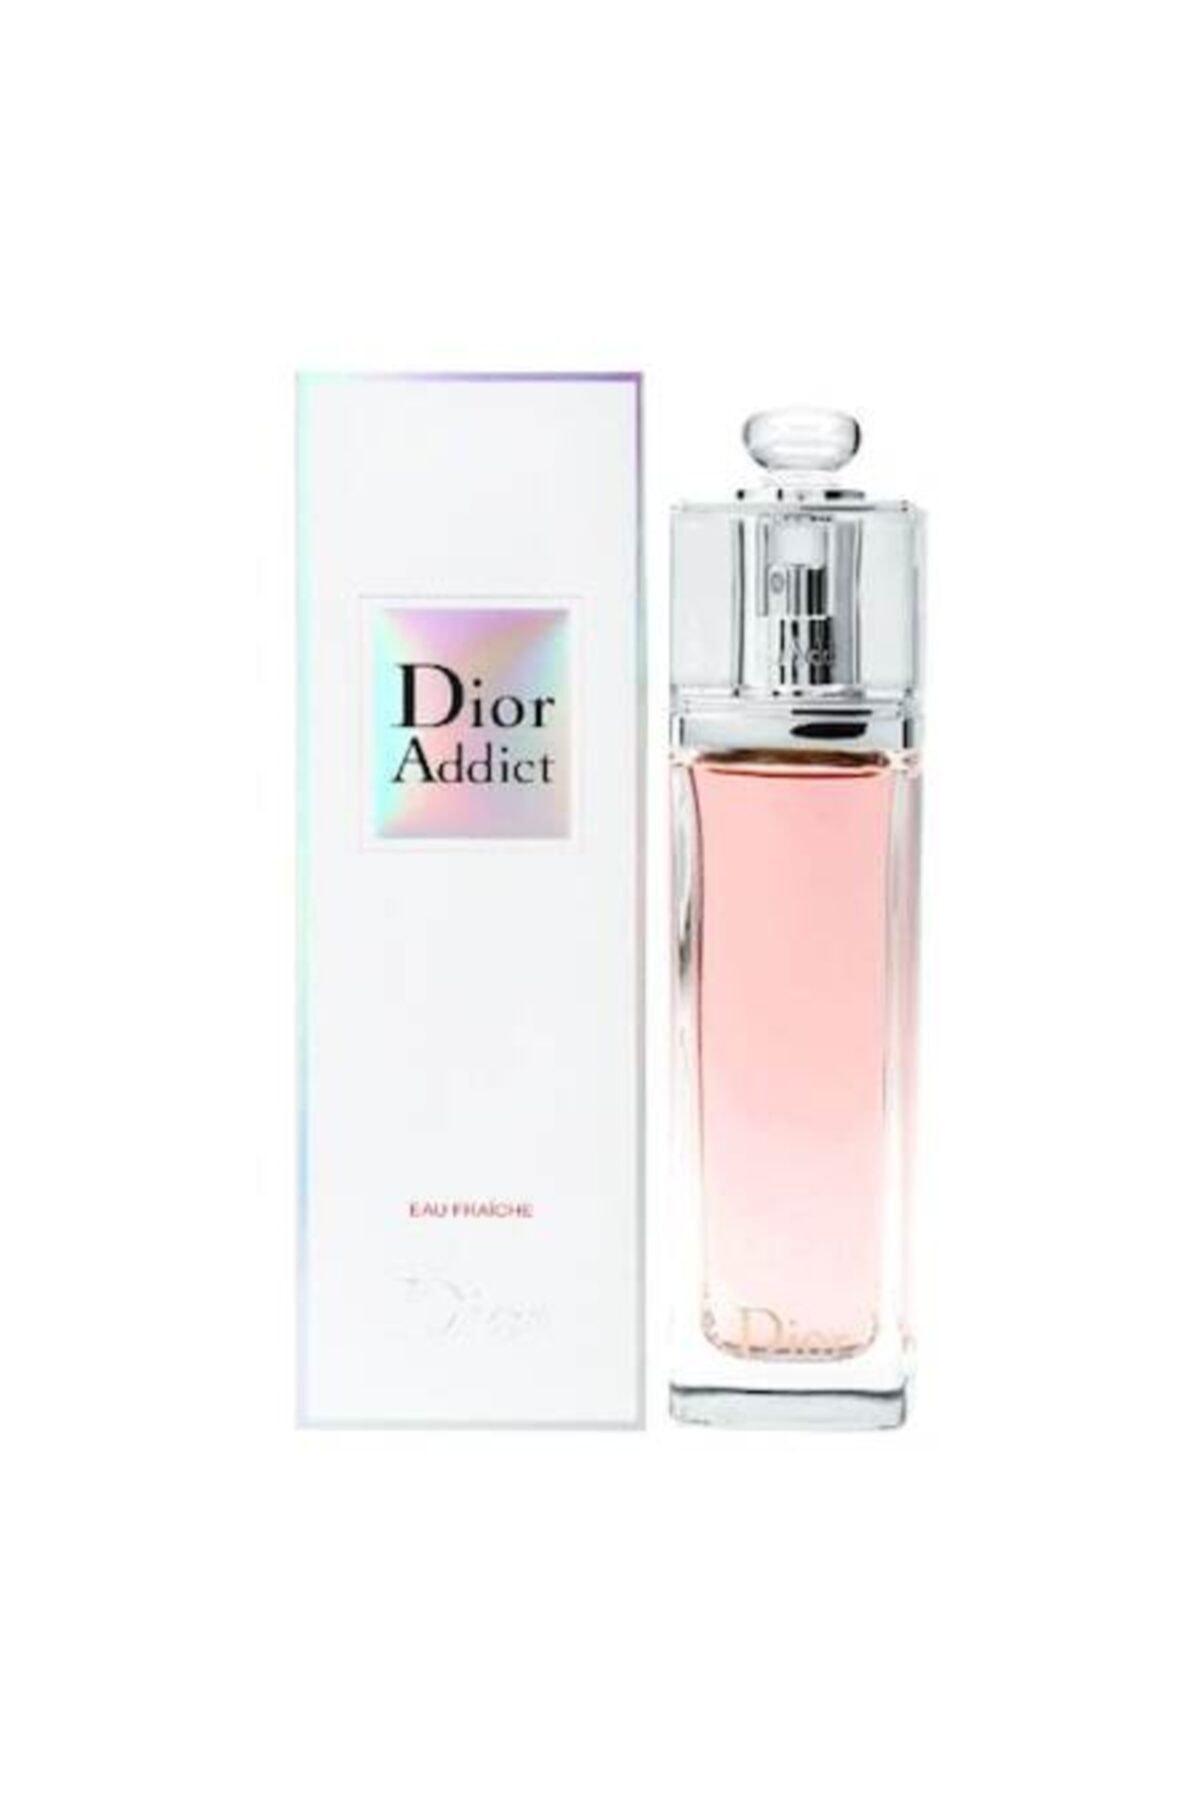 Dior Chrıstıan Dıor Addıct Eau Fraıche Edt 100ml 1